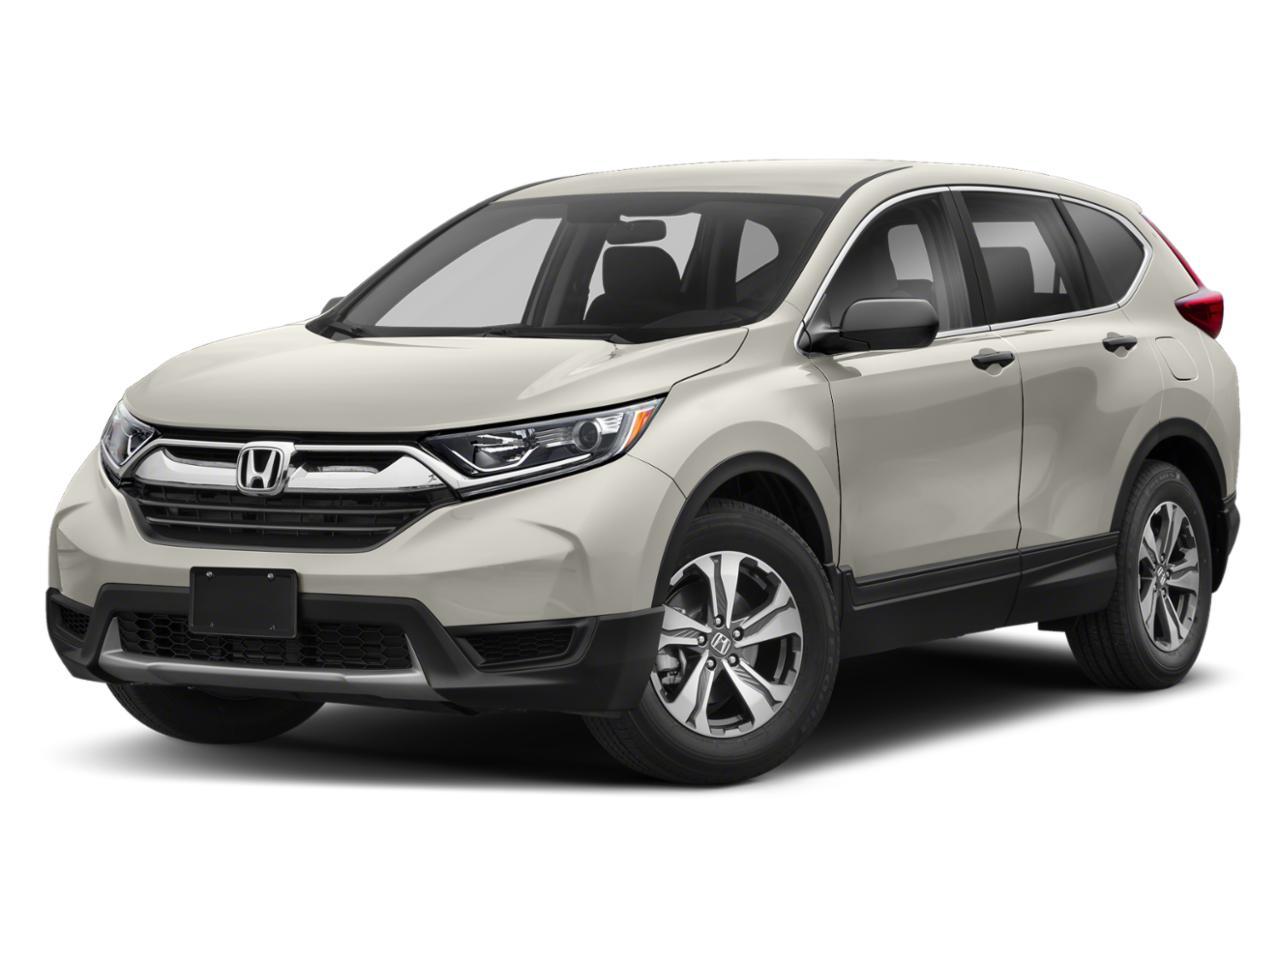 2019 Honda CR-V Vehicle Photo in Mission, TX 78572